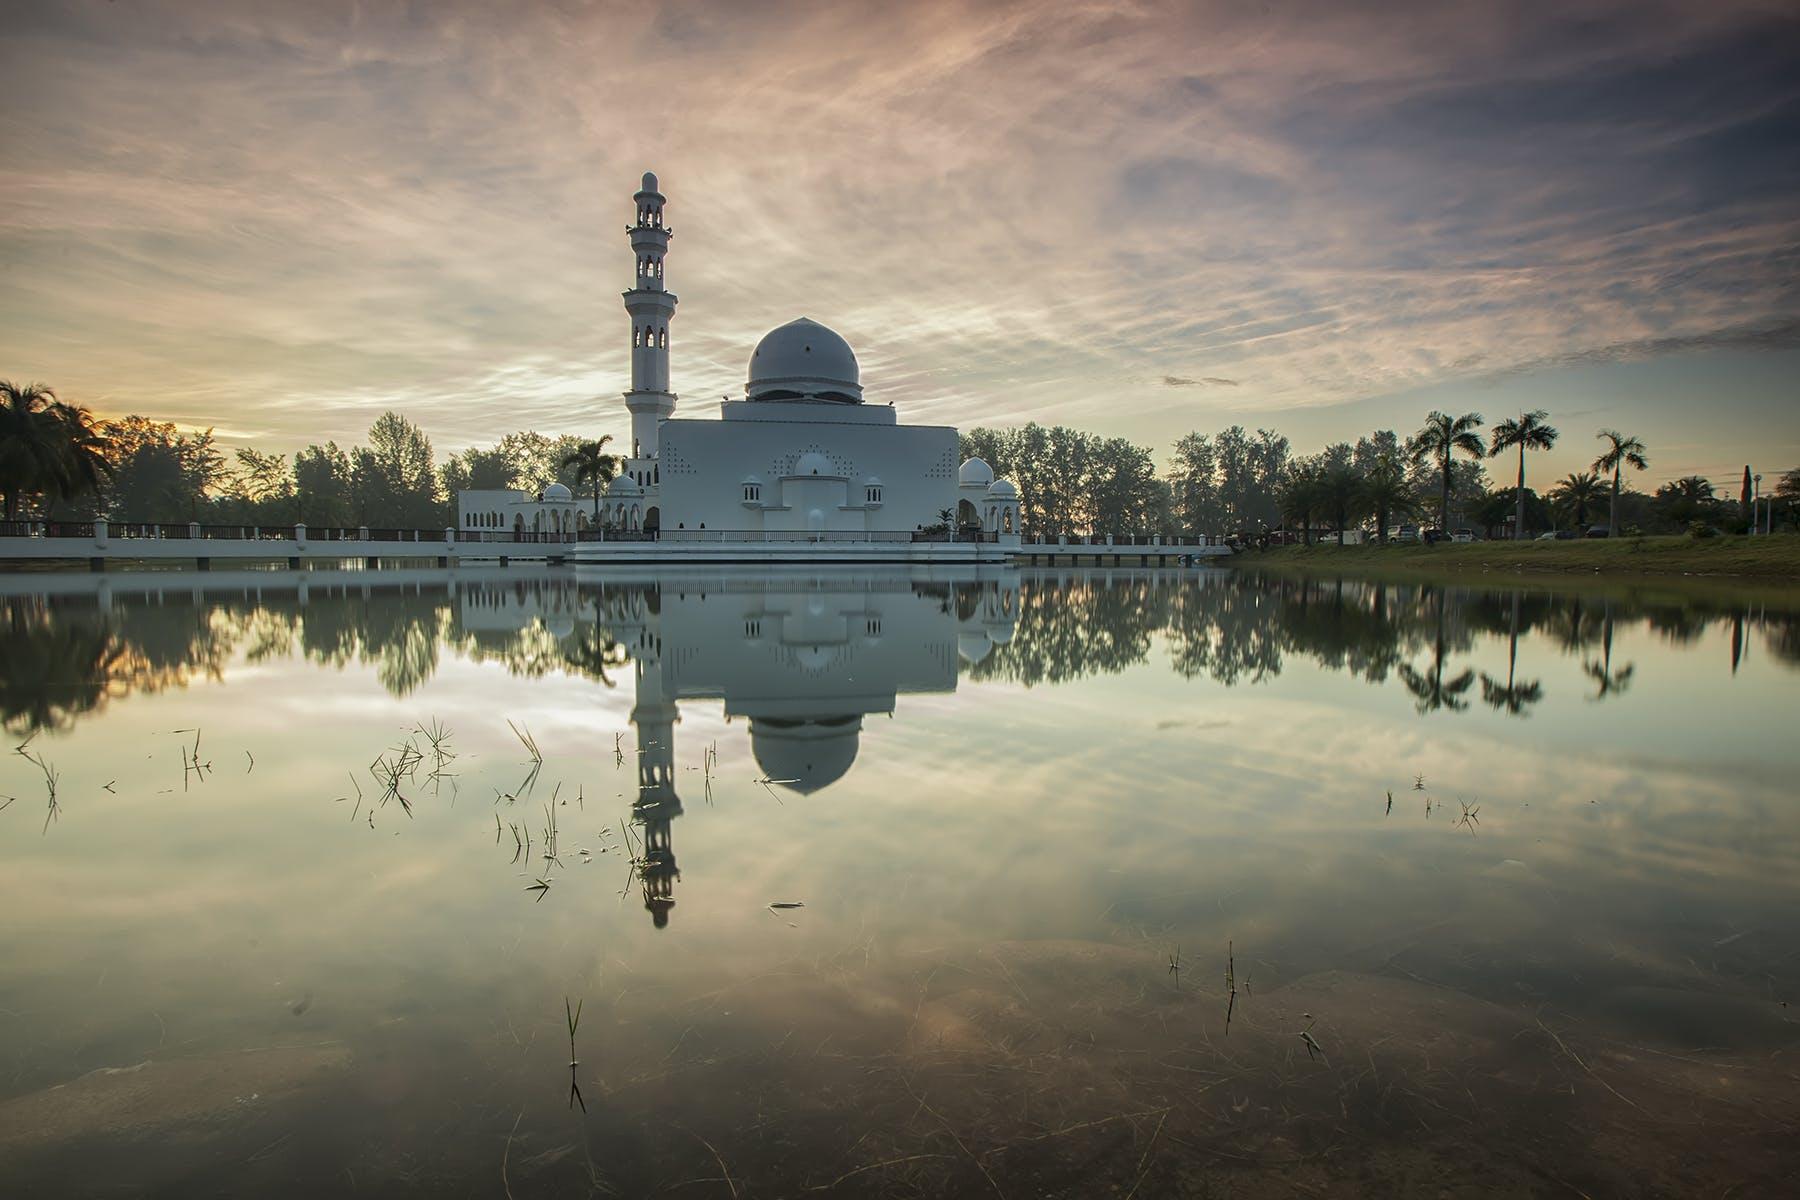 Kostnadsfri bild av arkitektonisk design, himmel, idyllisk, islamisk